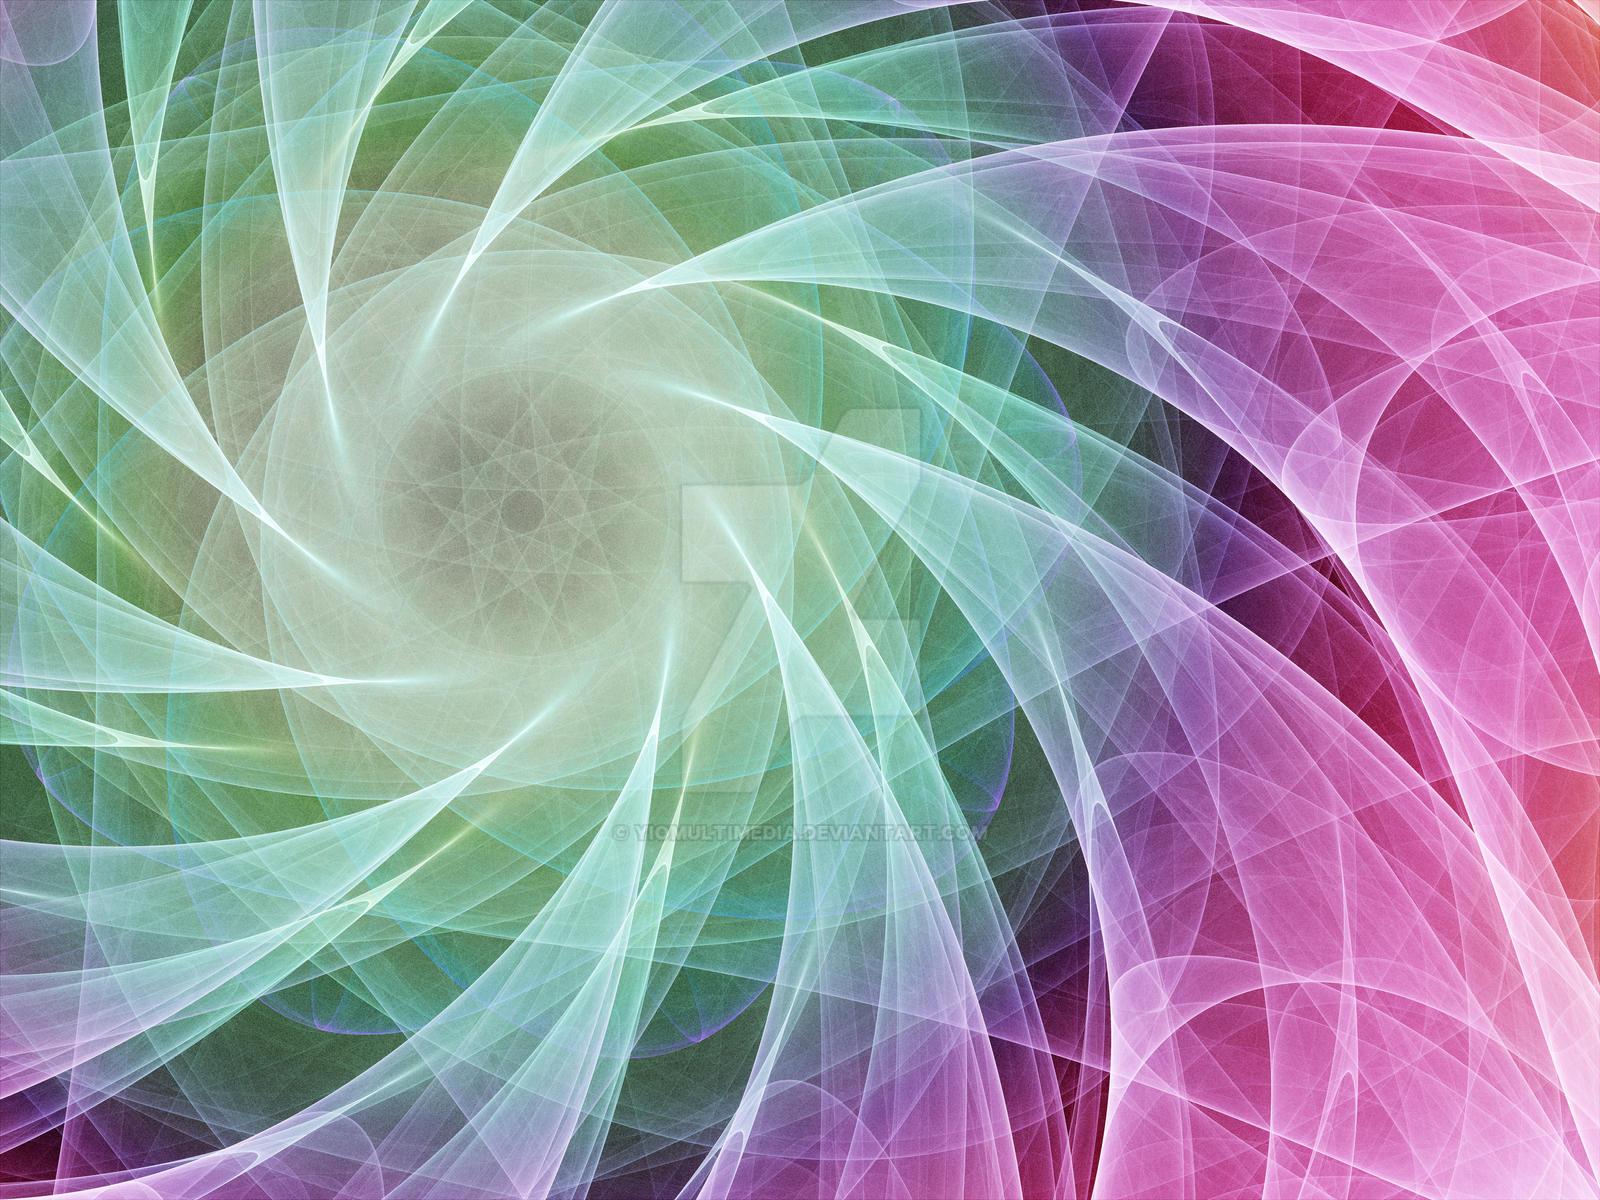 Whirlpool Diamond 2 by yiomultimedia